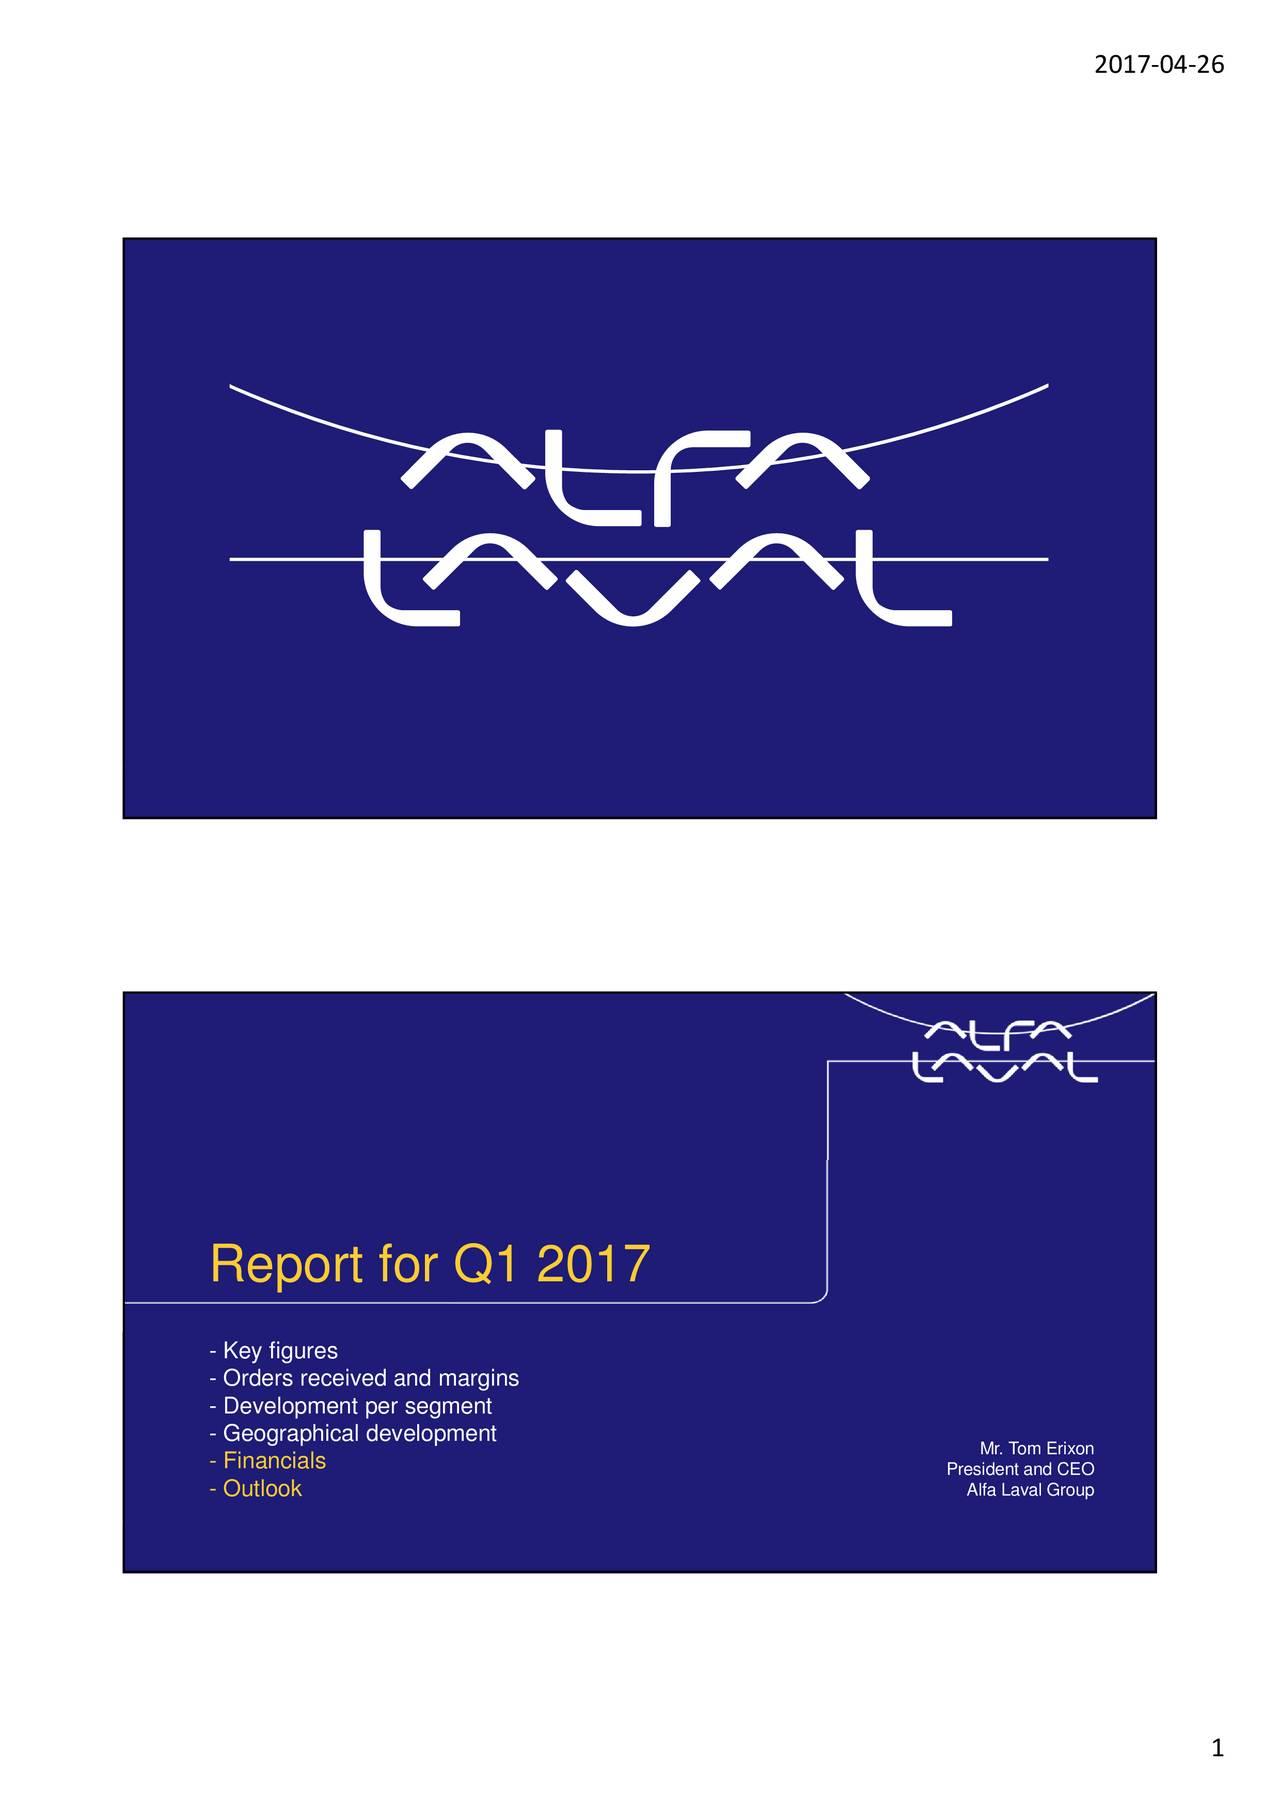 Alfa laval annual report 2016 Уплотнения теплообменника Теплотекс 50A Кисловодск